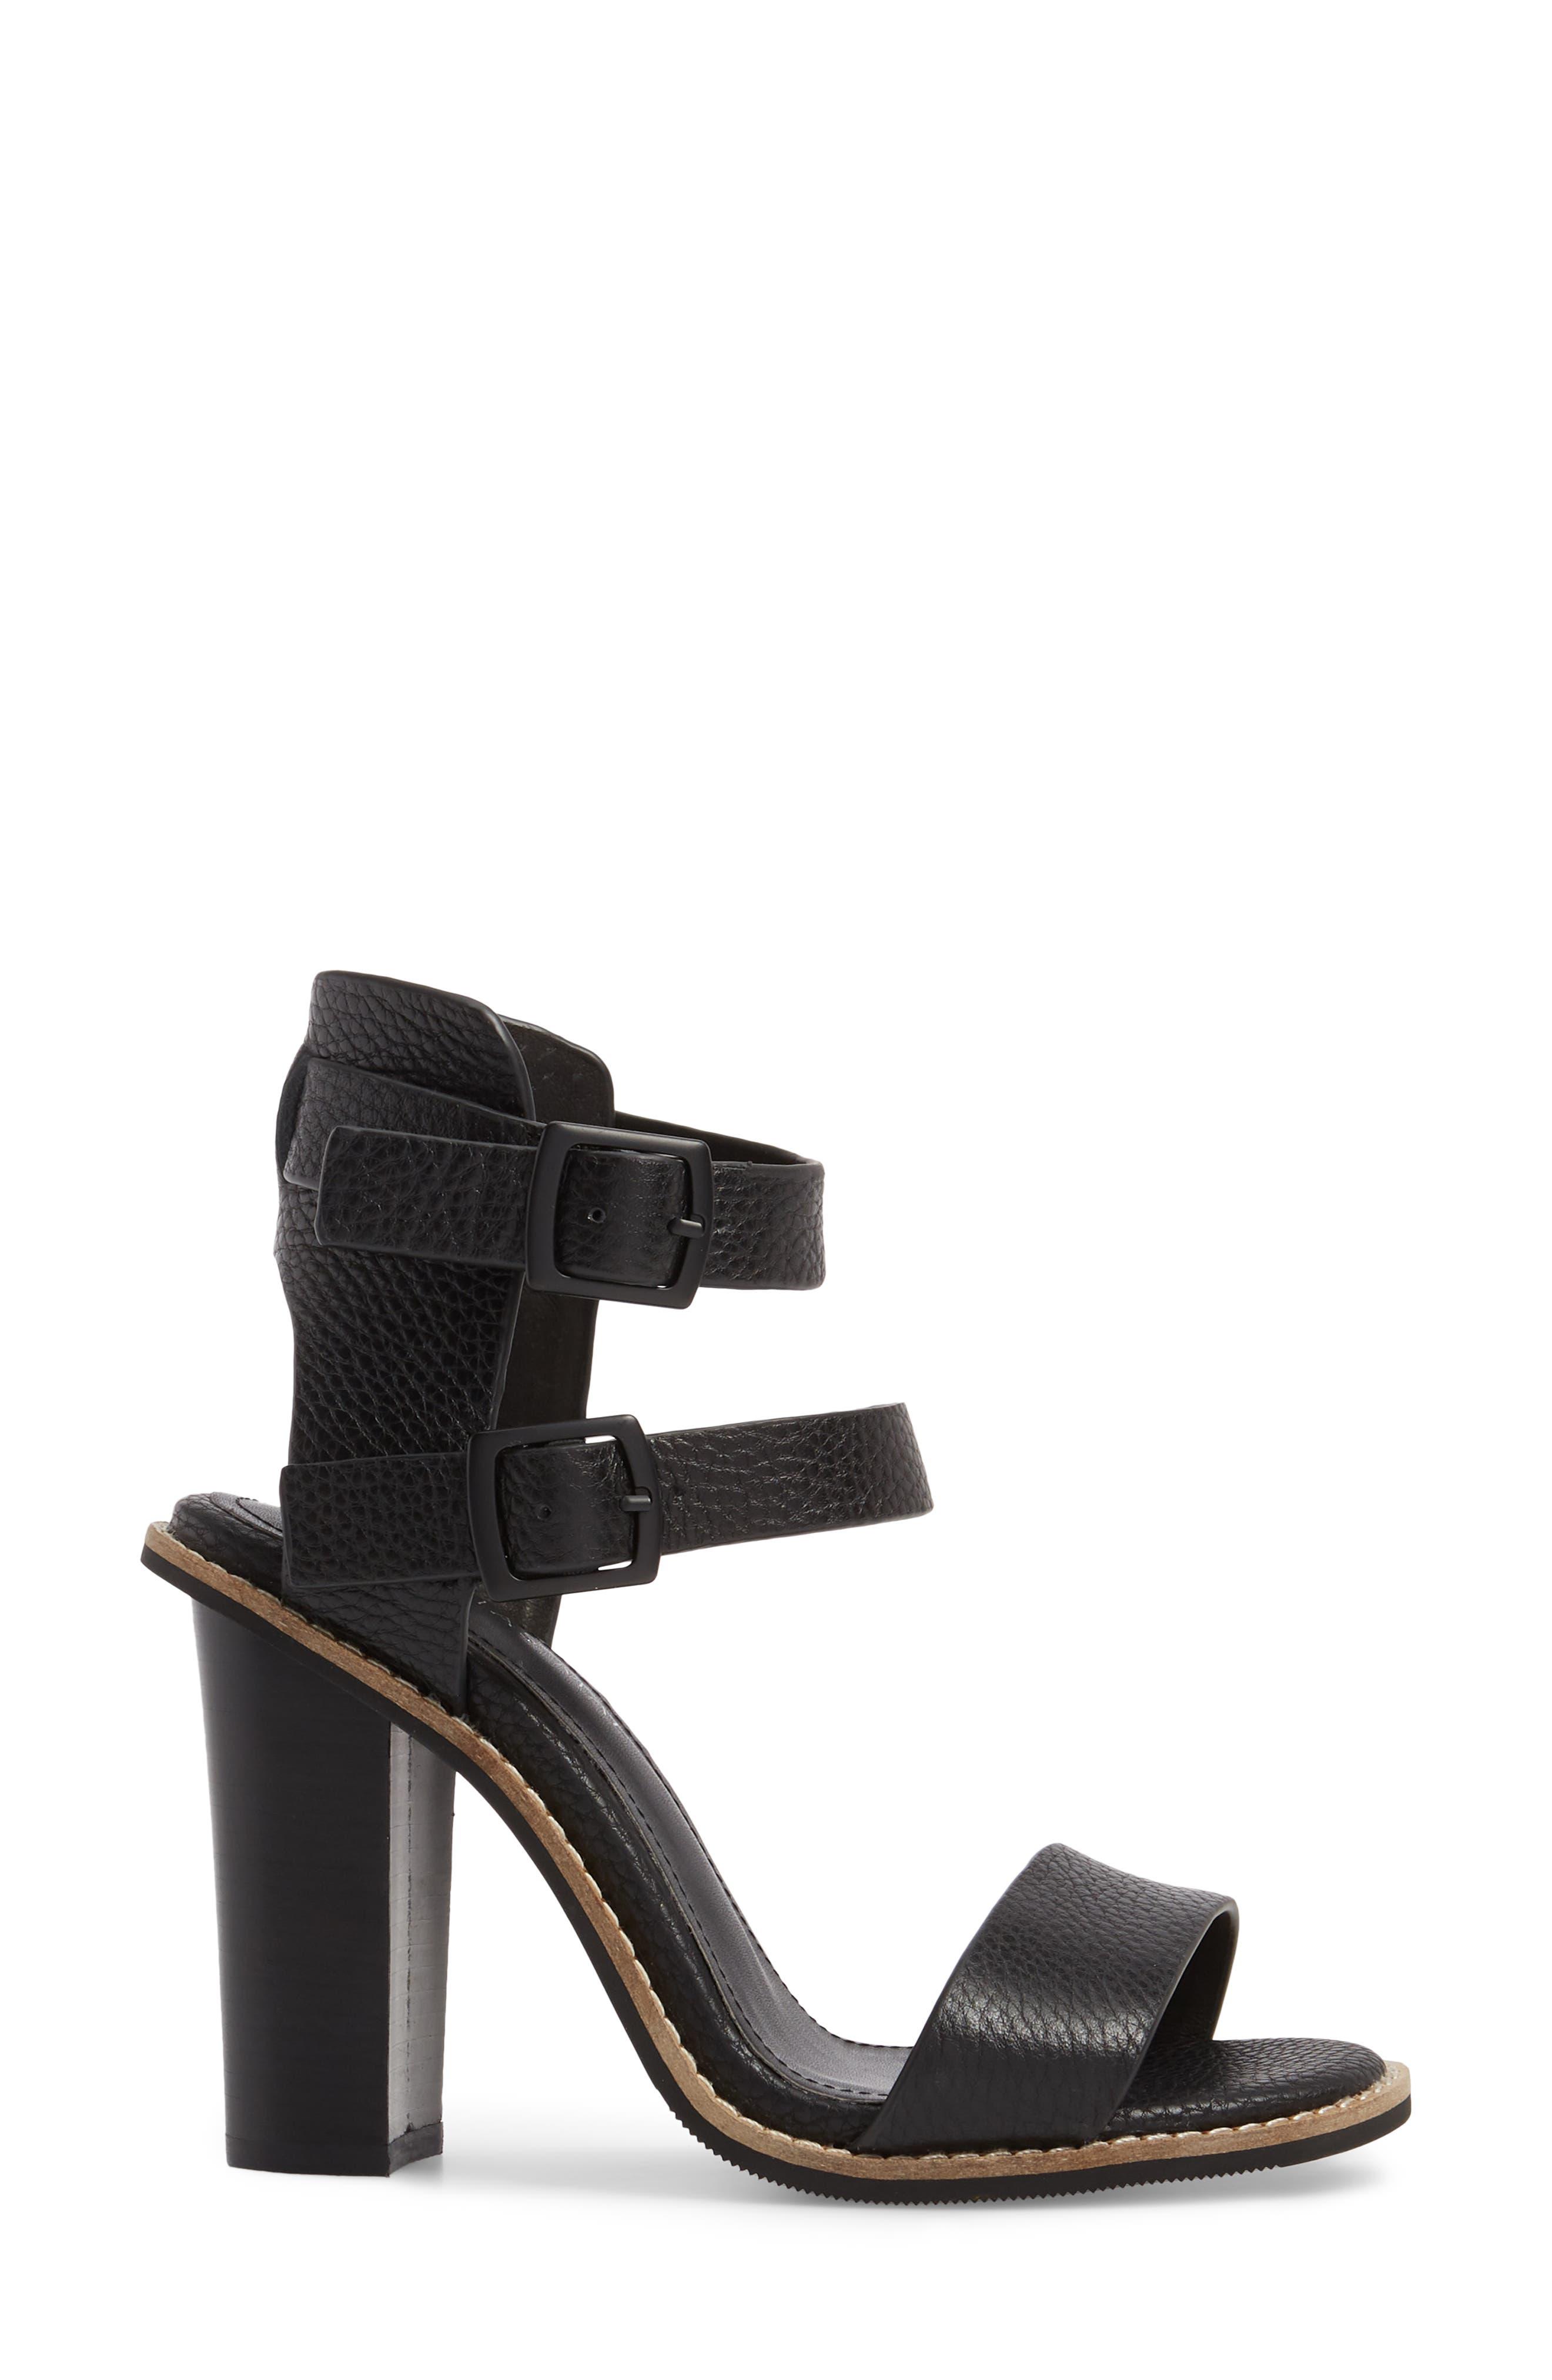 Casper Tall Sandal,                             Alternate thumbnail 3, color,                             Black Leather